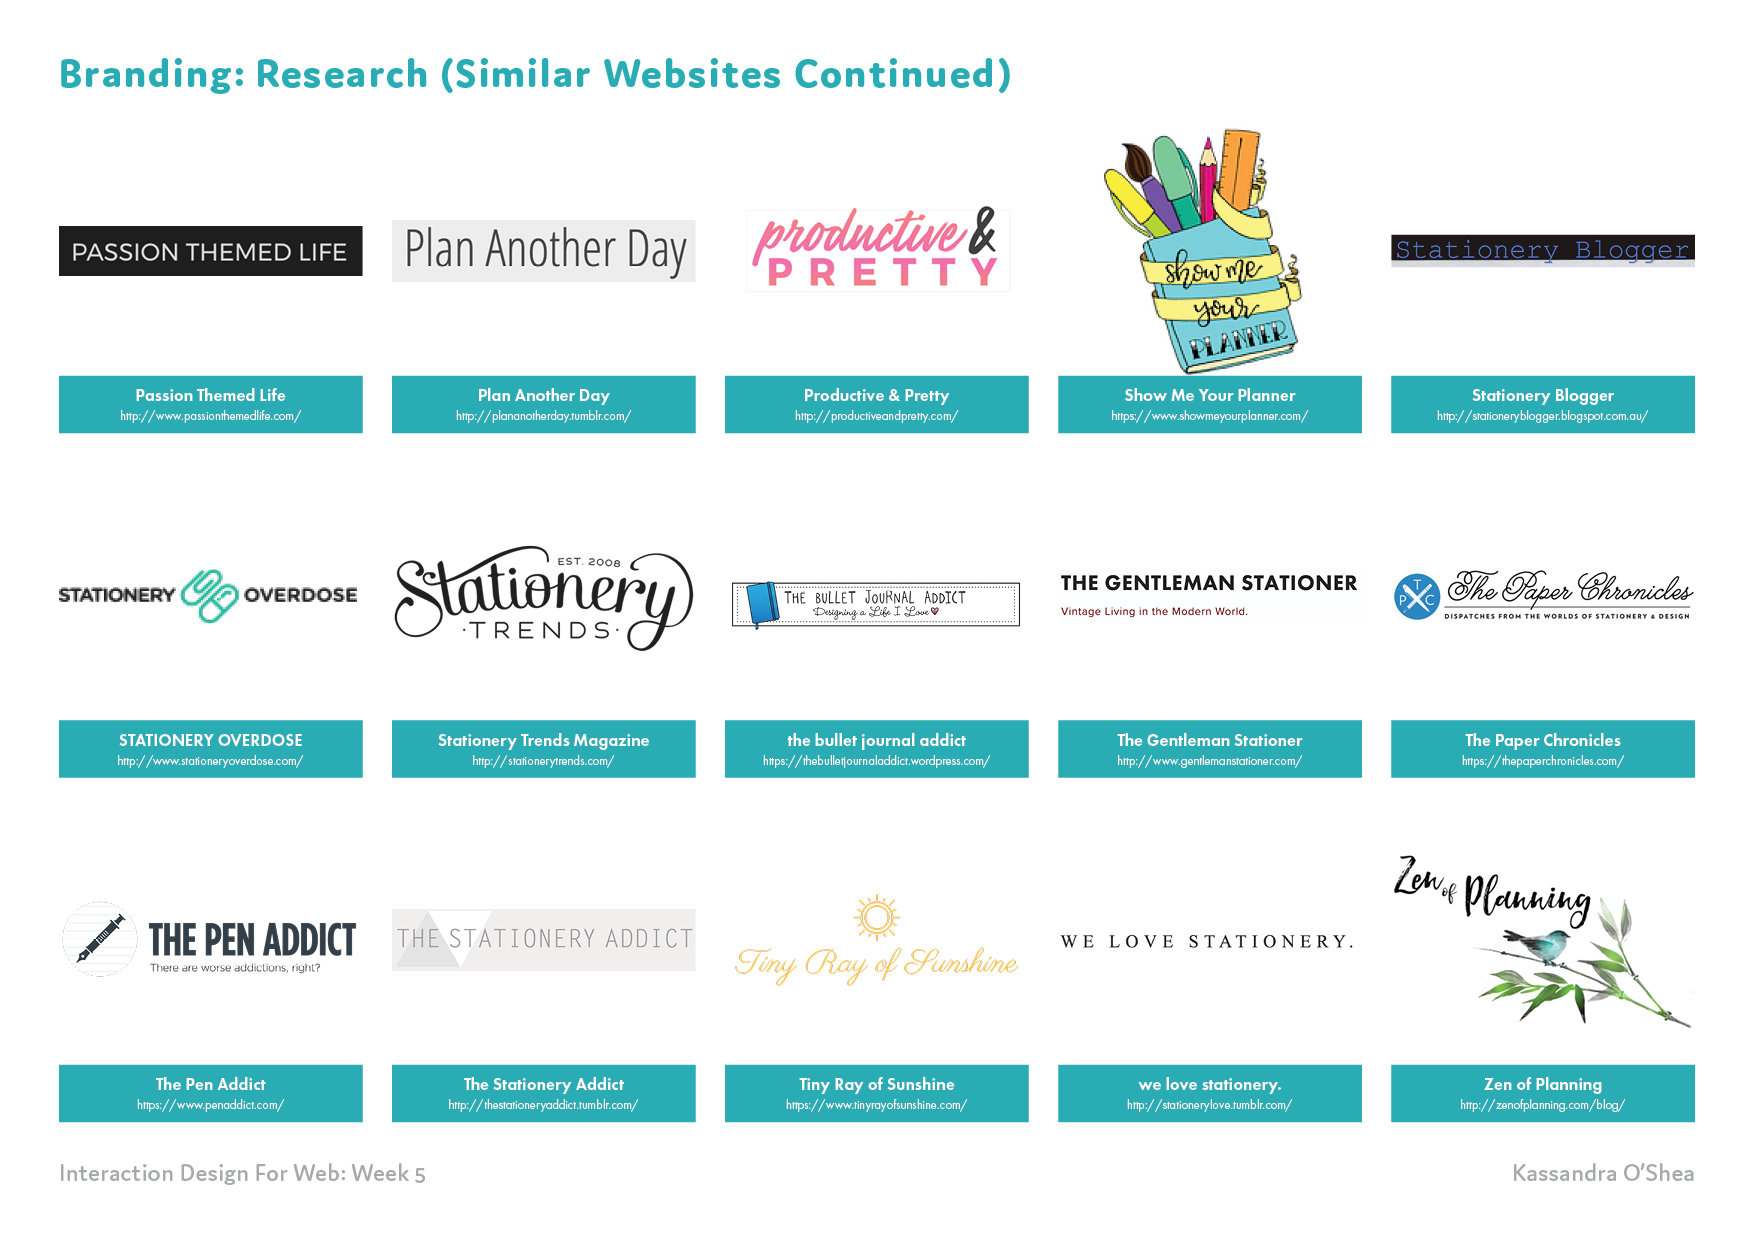 Branding: Research (Similar Websites)